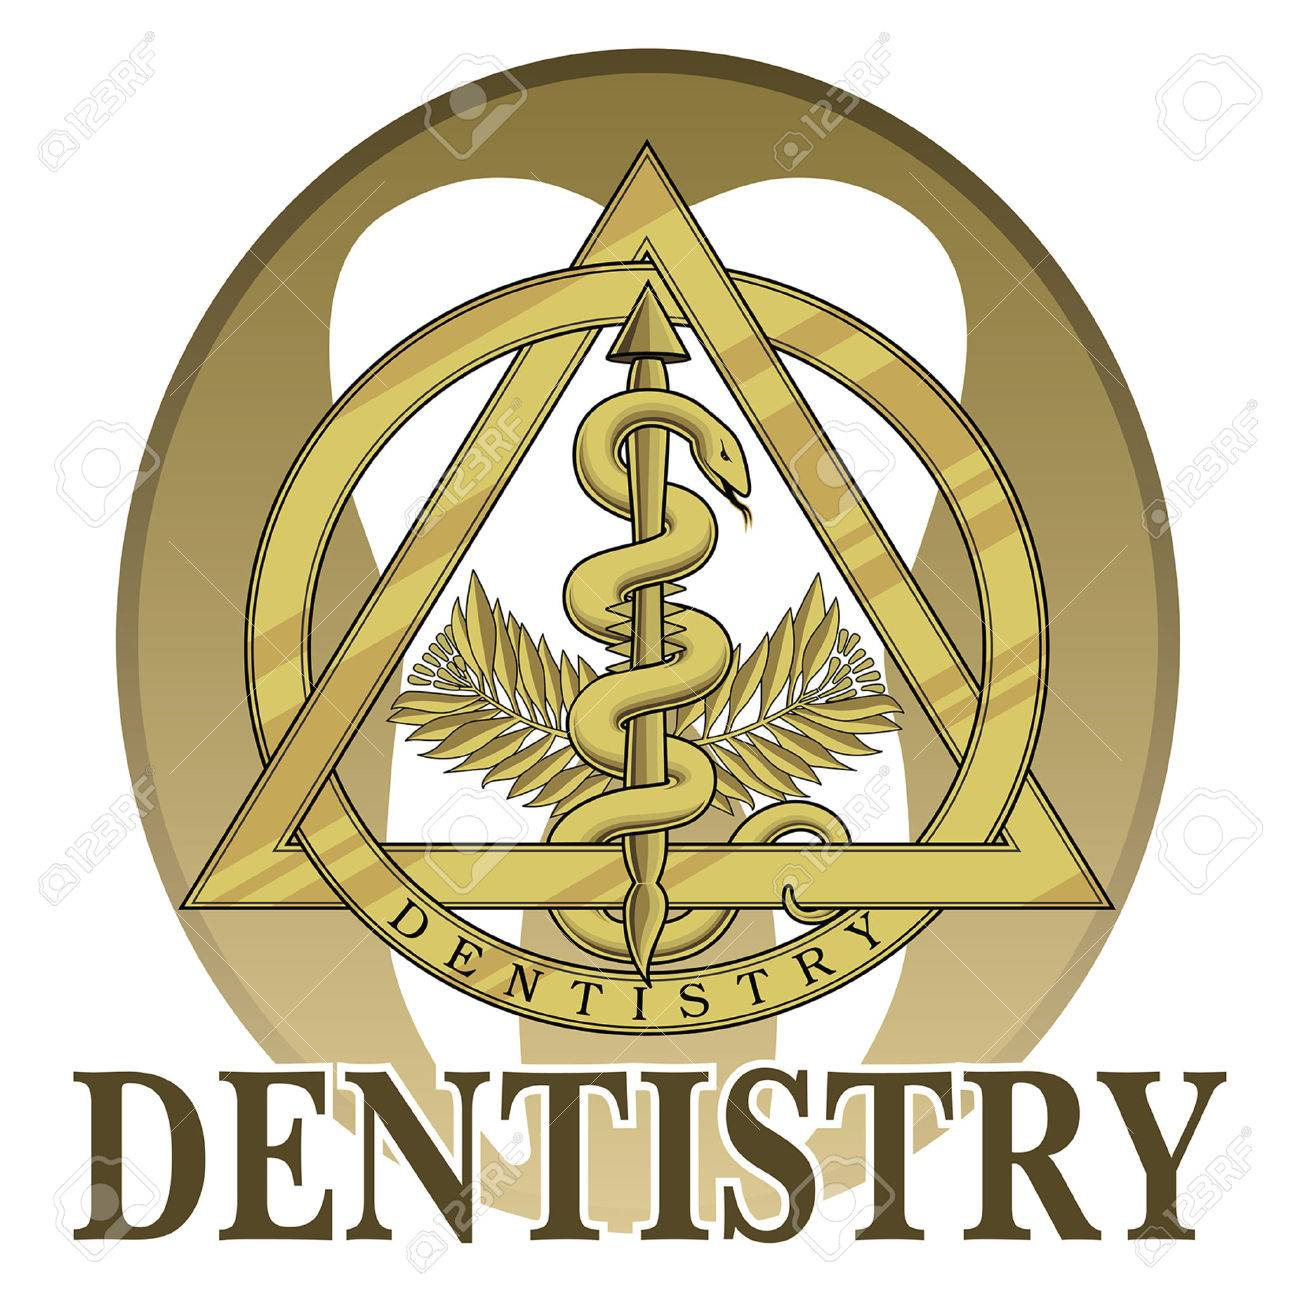 dentistry symbol design is